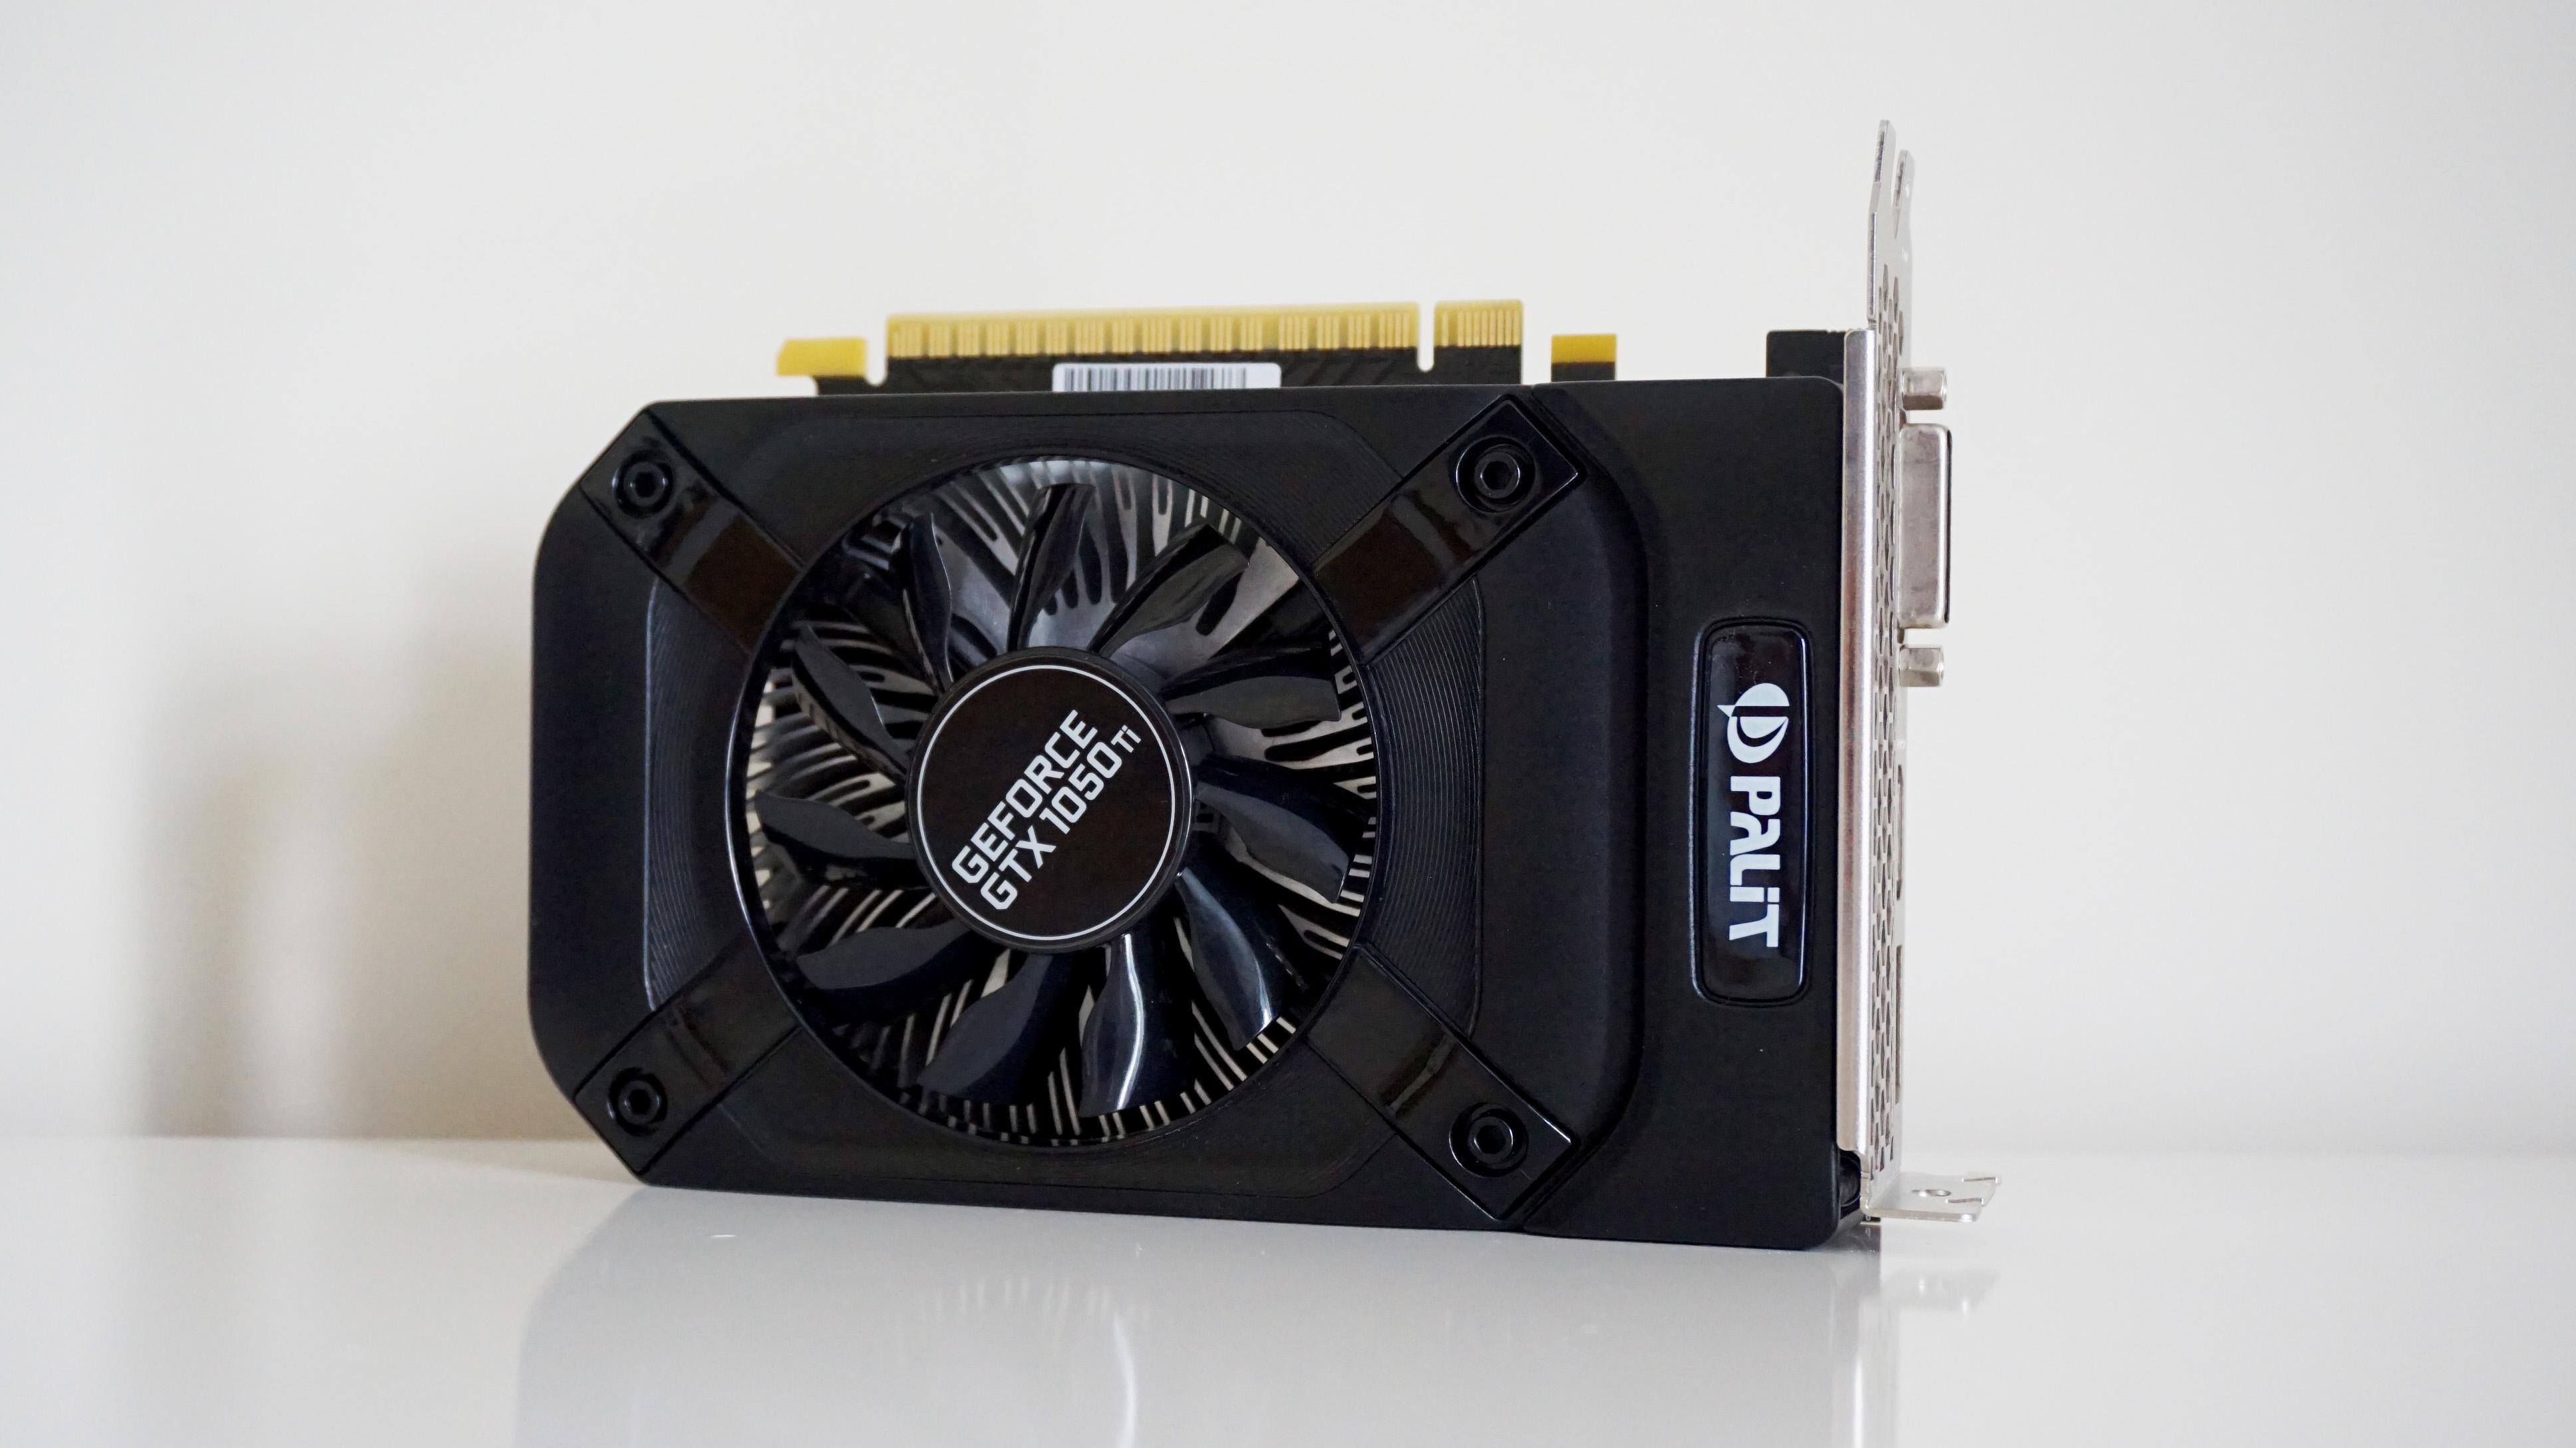 Division 2 PC Performance - GTX 1050 Ti